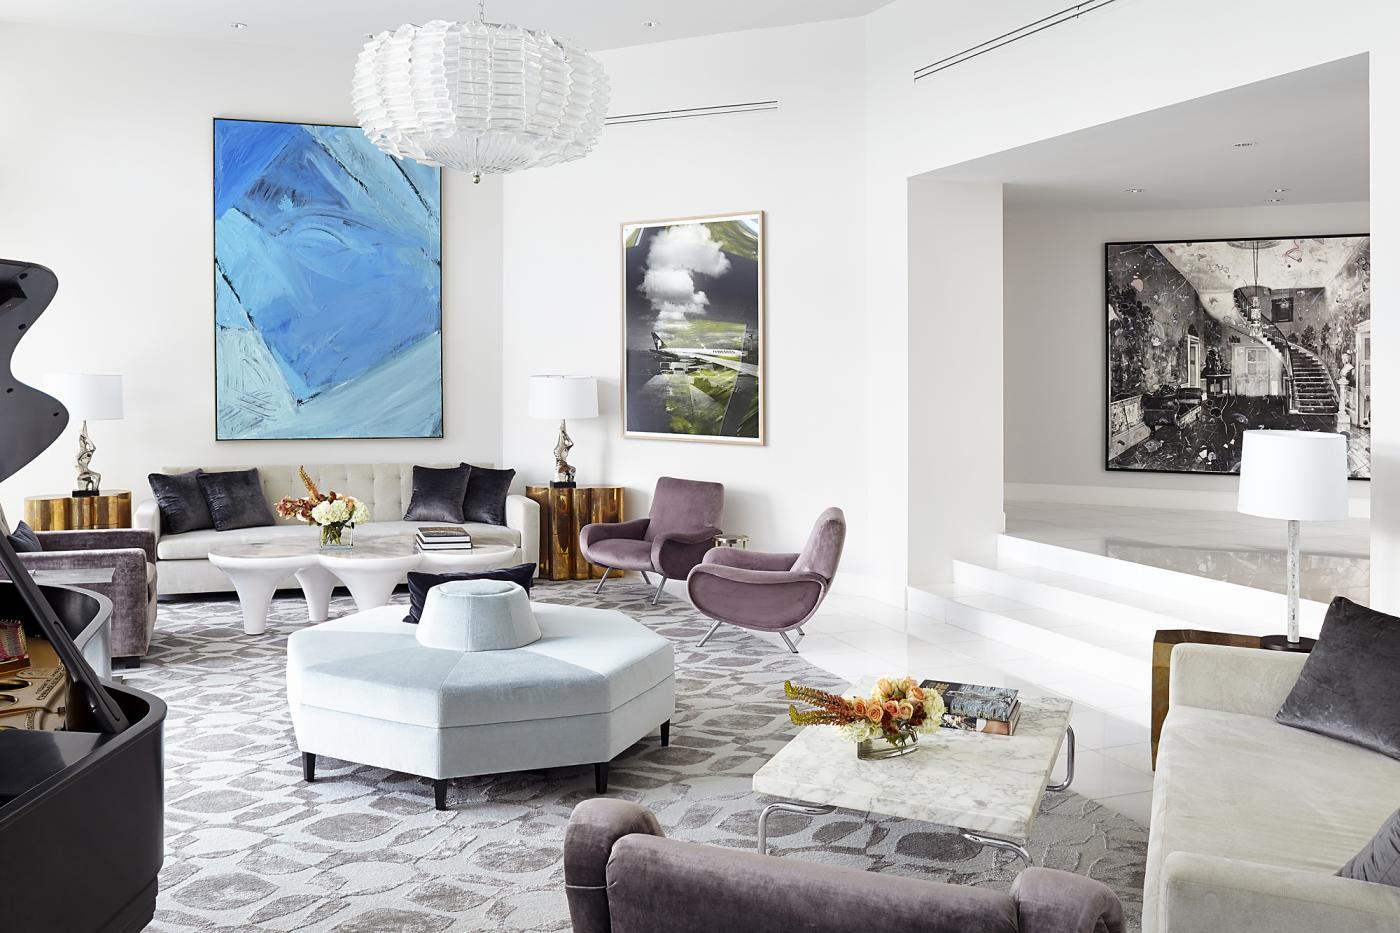 Miami Vice House